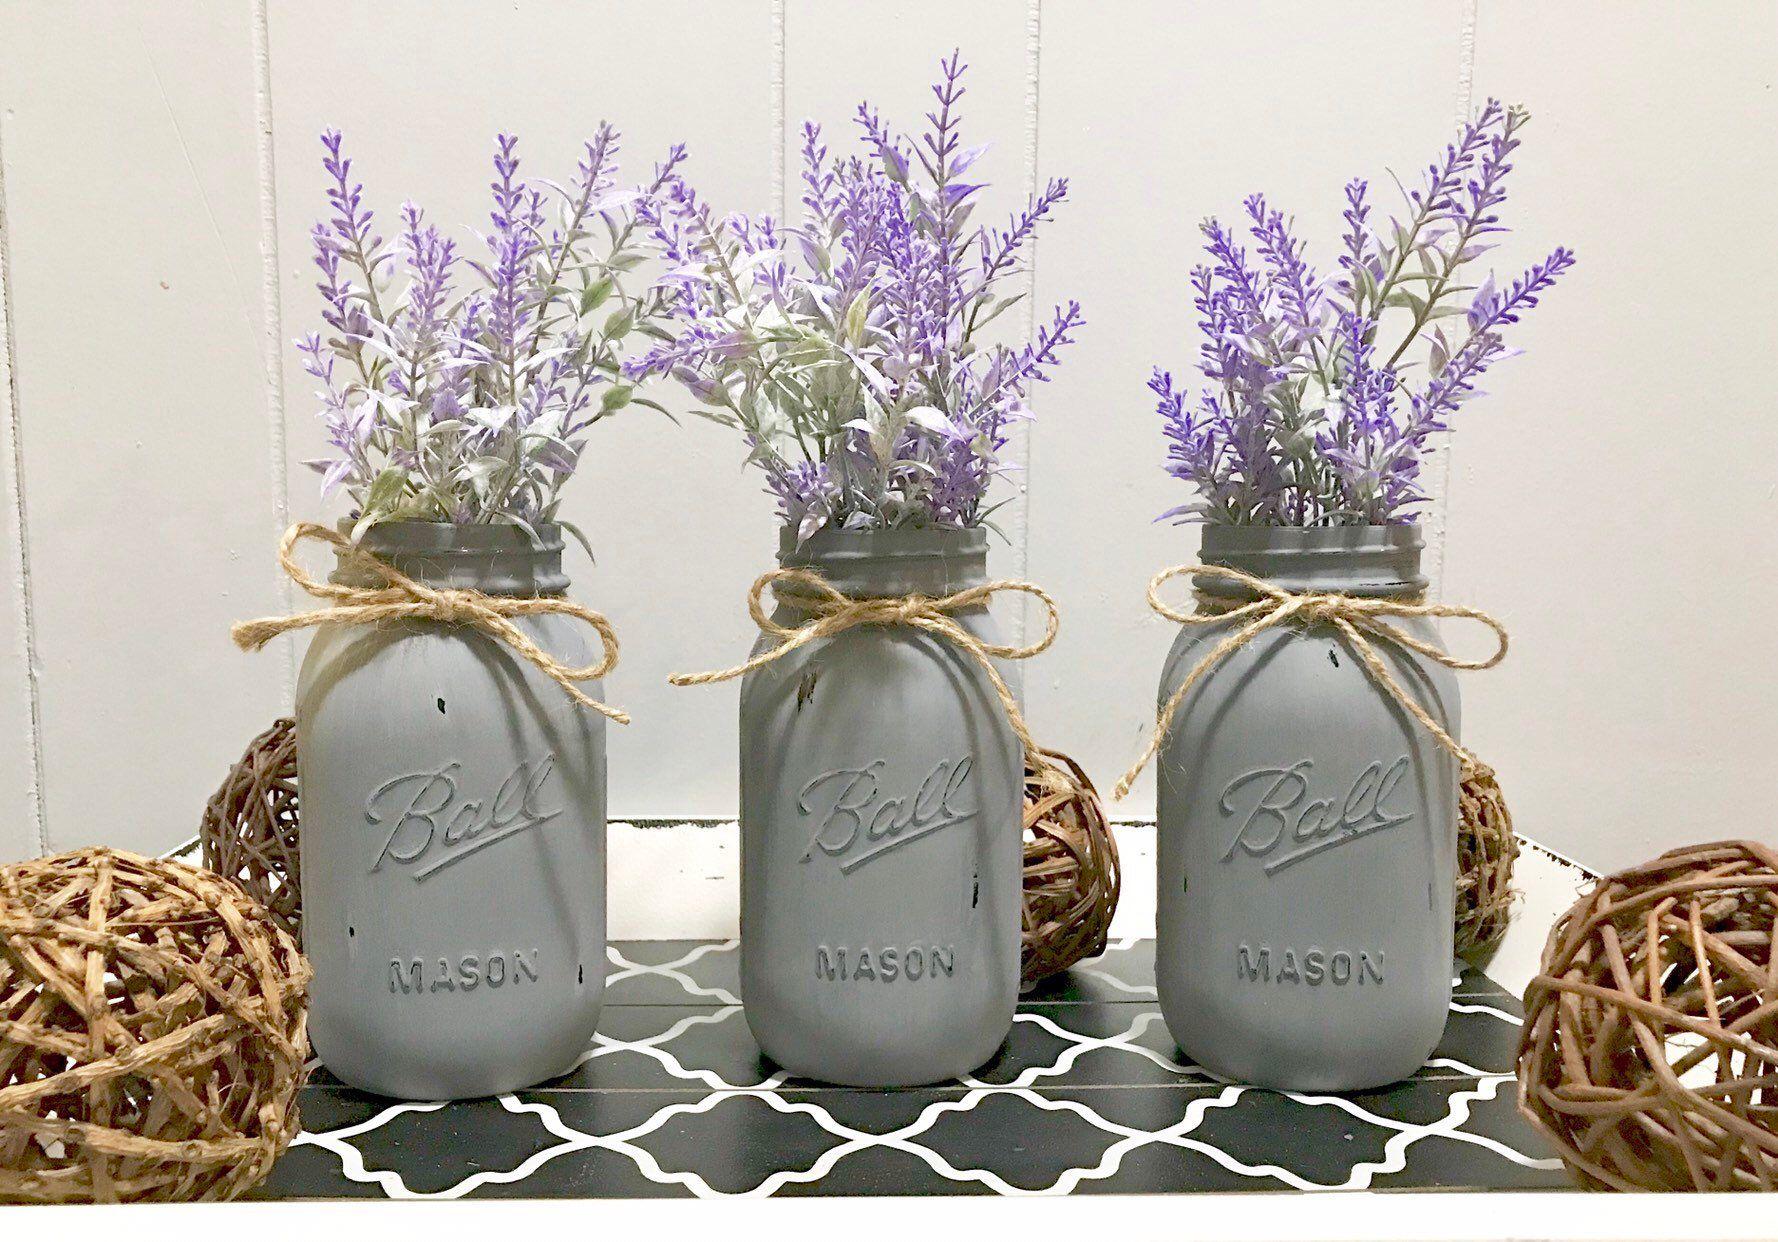 Excited to share the latest addition to my #etsy shop: Mason Jar Centerpiece, Mason Jar Decor, Mason Jar, #housewares #homedecor #entryway #jardecor #masonjar #kitchentabledecor #coffeetabledecor #rusticdecor #homedecorfarmhouse